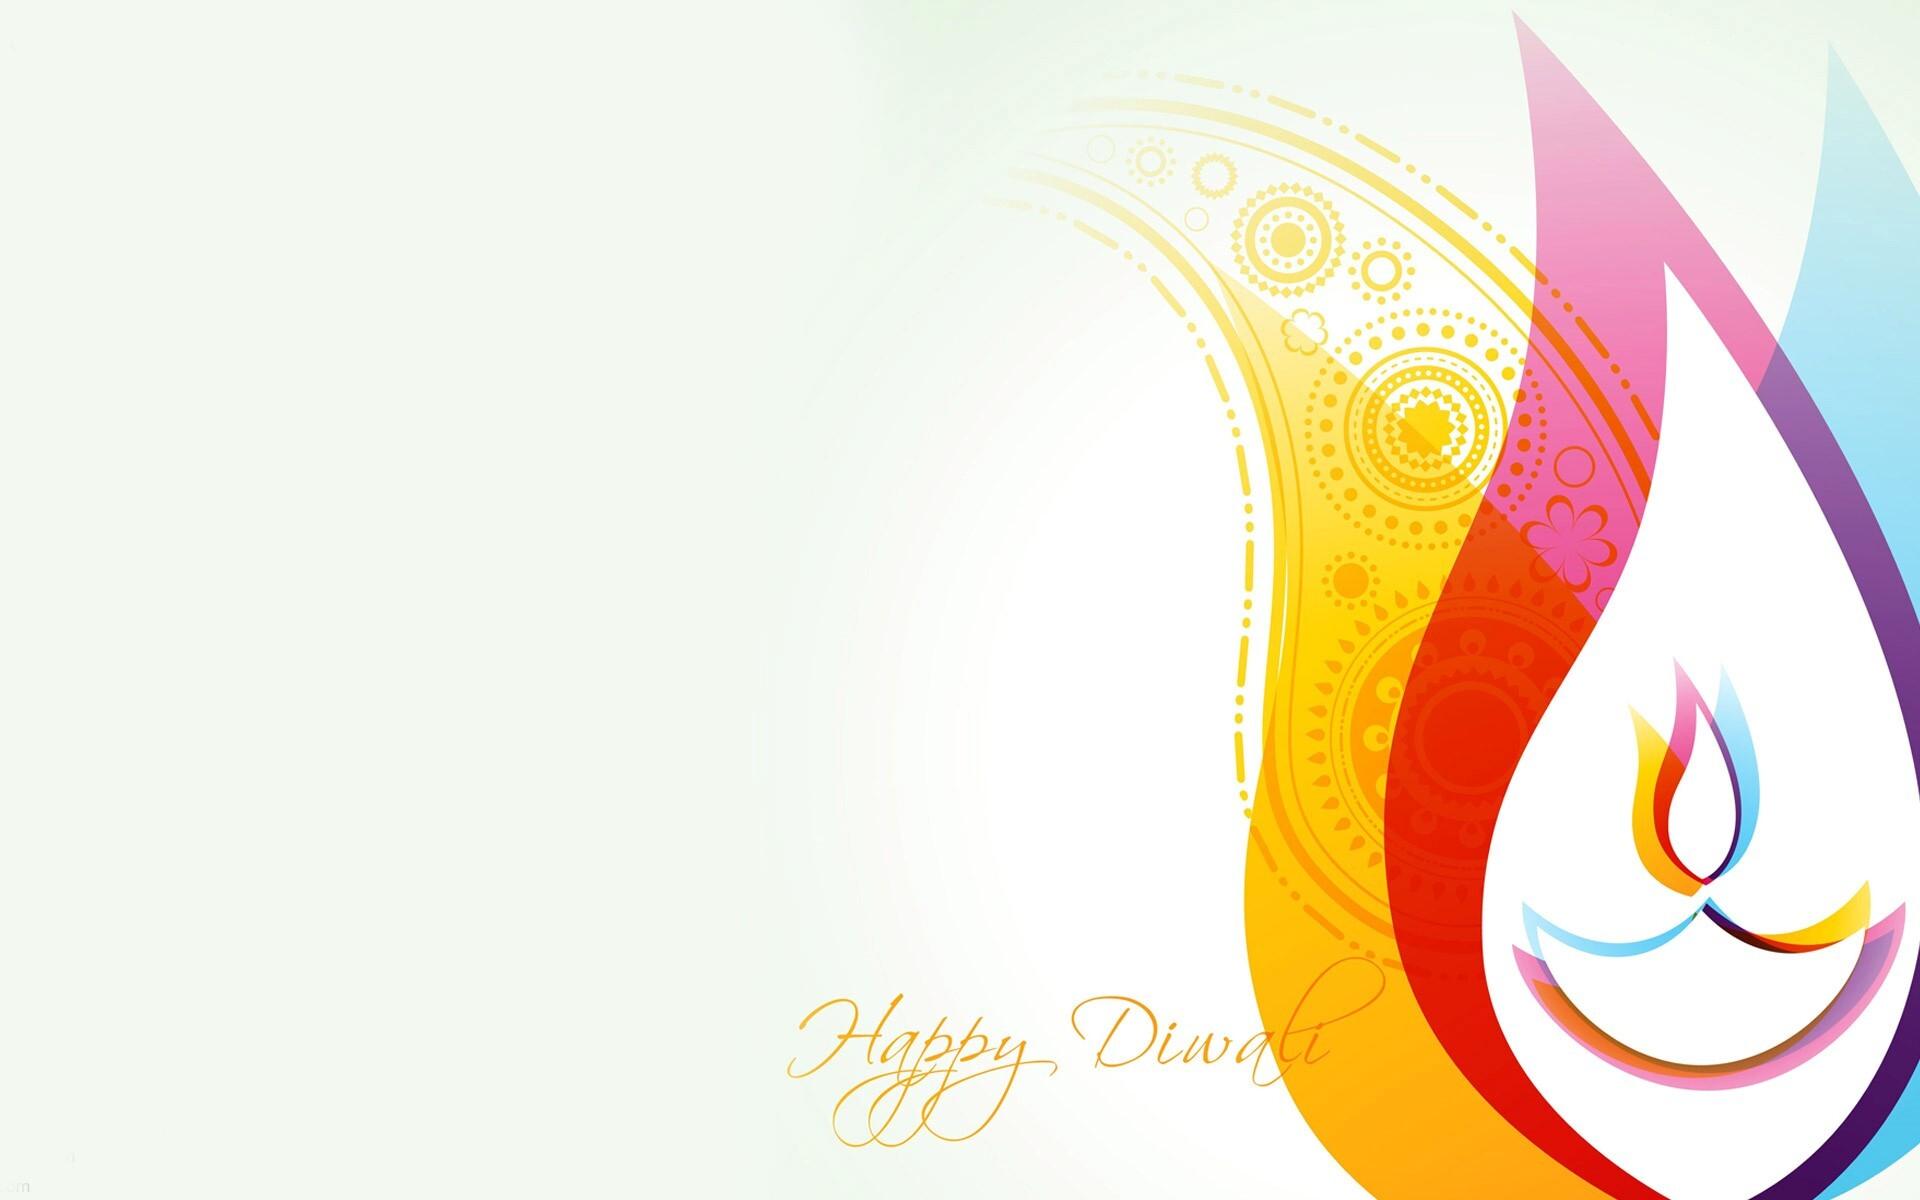 Beautiful happy diwali greetings card wallpaper free download hd beautiful happy diwali greetings card wallpaper free download download m4hsunfo